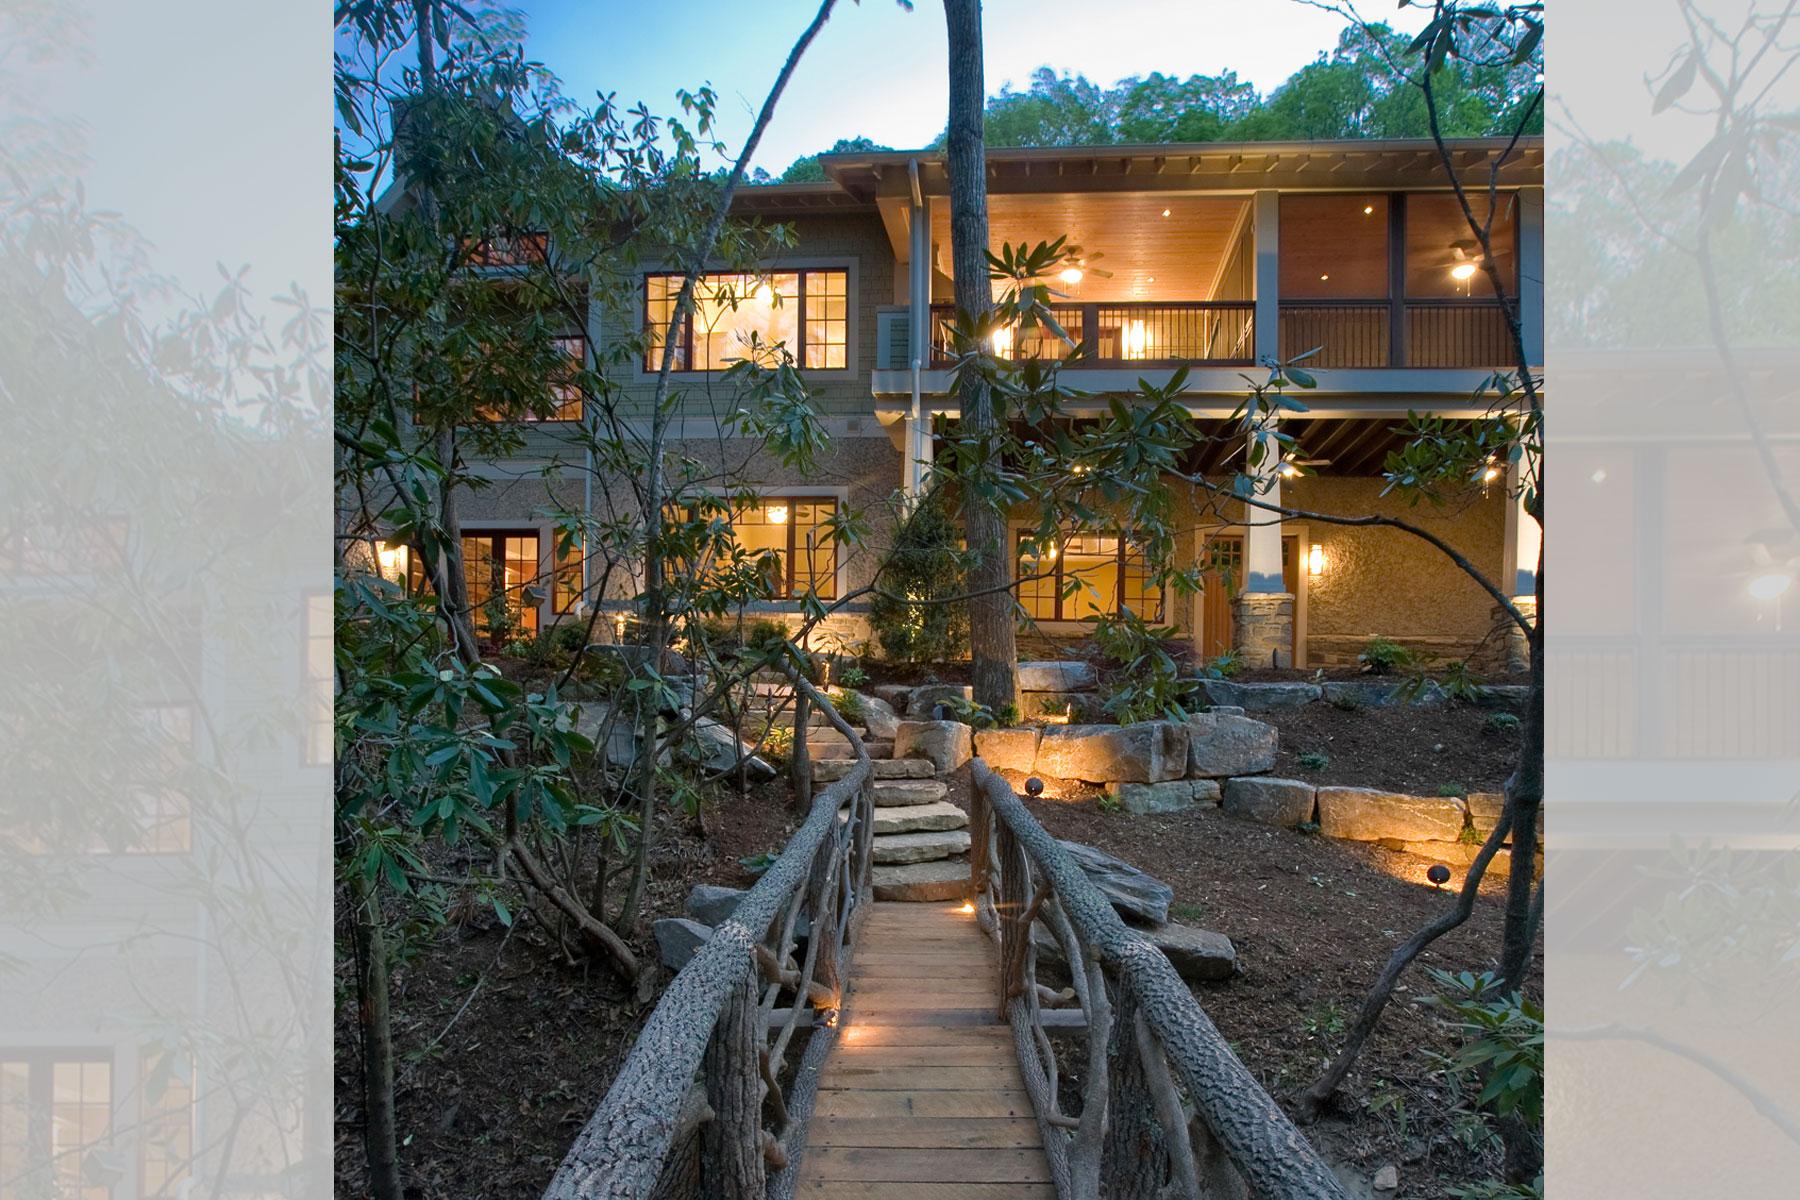 Bridge in backyard of mountain craftsman home